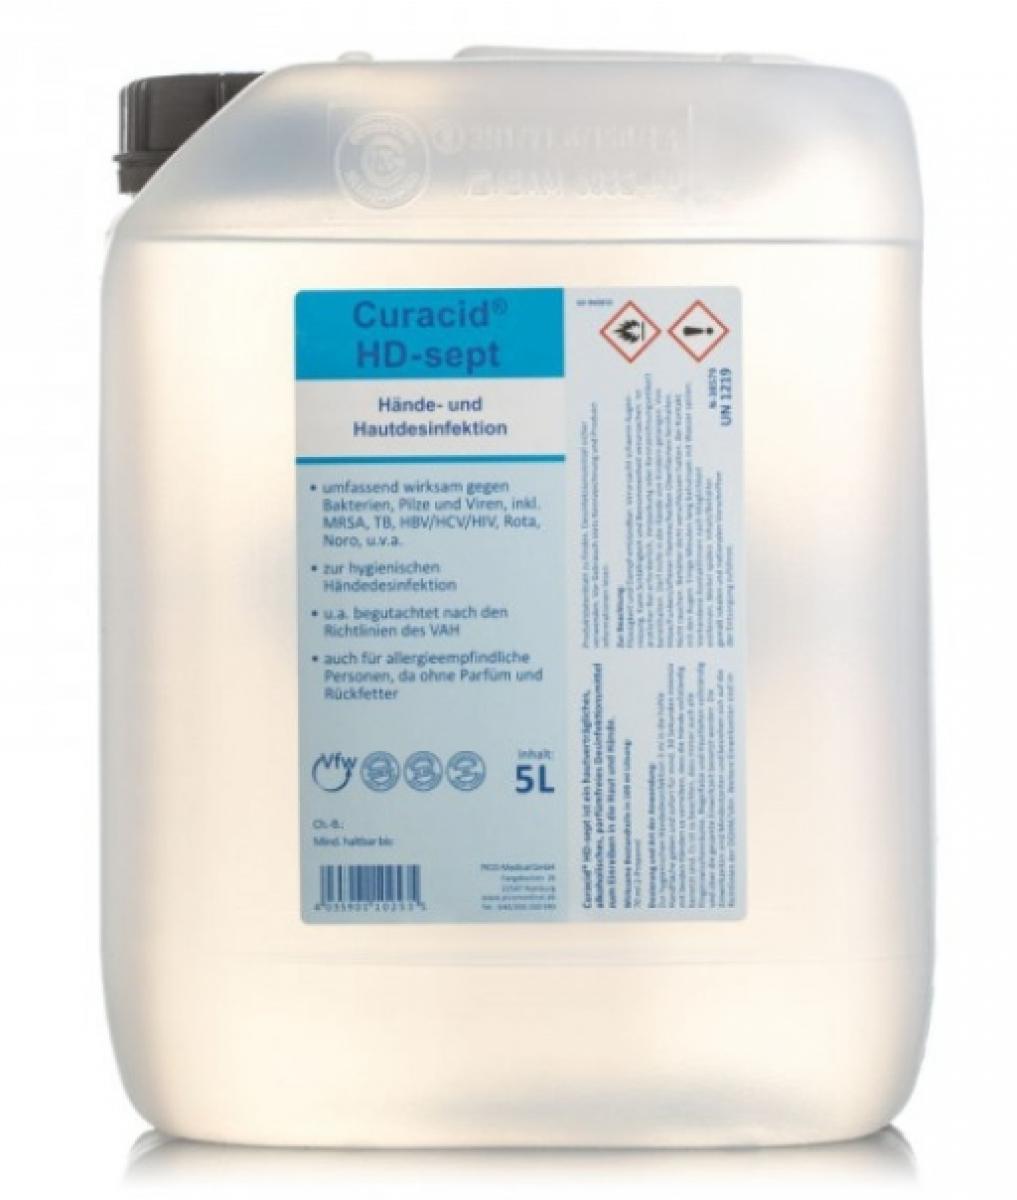 Medizin & Labor Ärztebedarf Handdesinfektion Hautdesinfektion Desinfektionsmittel 5 Liter